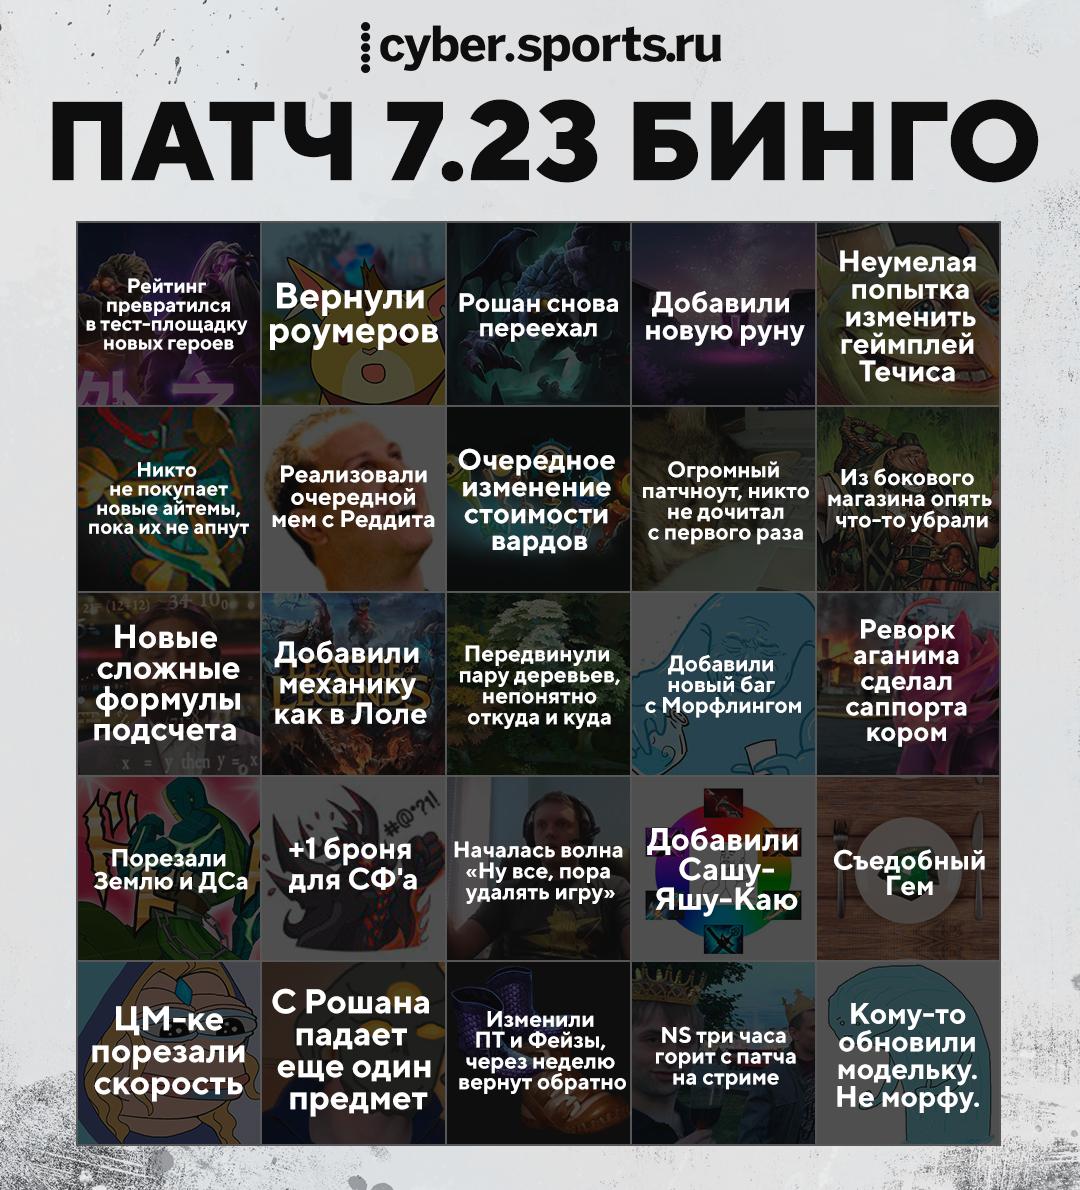 Патч 7.23 в Dota 2, Valve, Dota 2, IceFrog, Morphling, Crystal Maiden